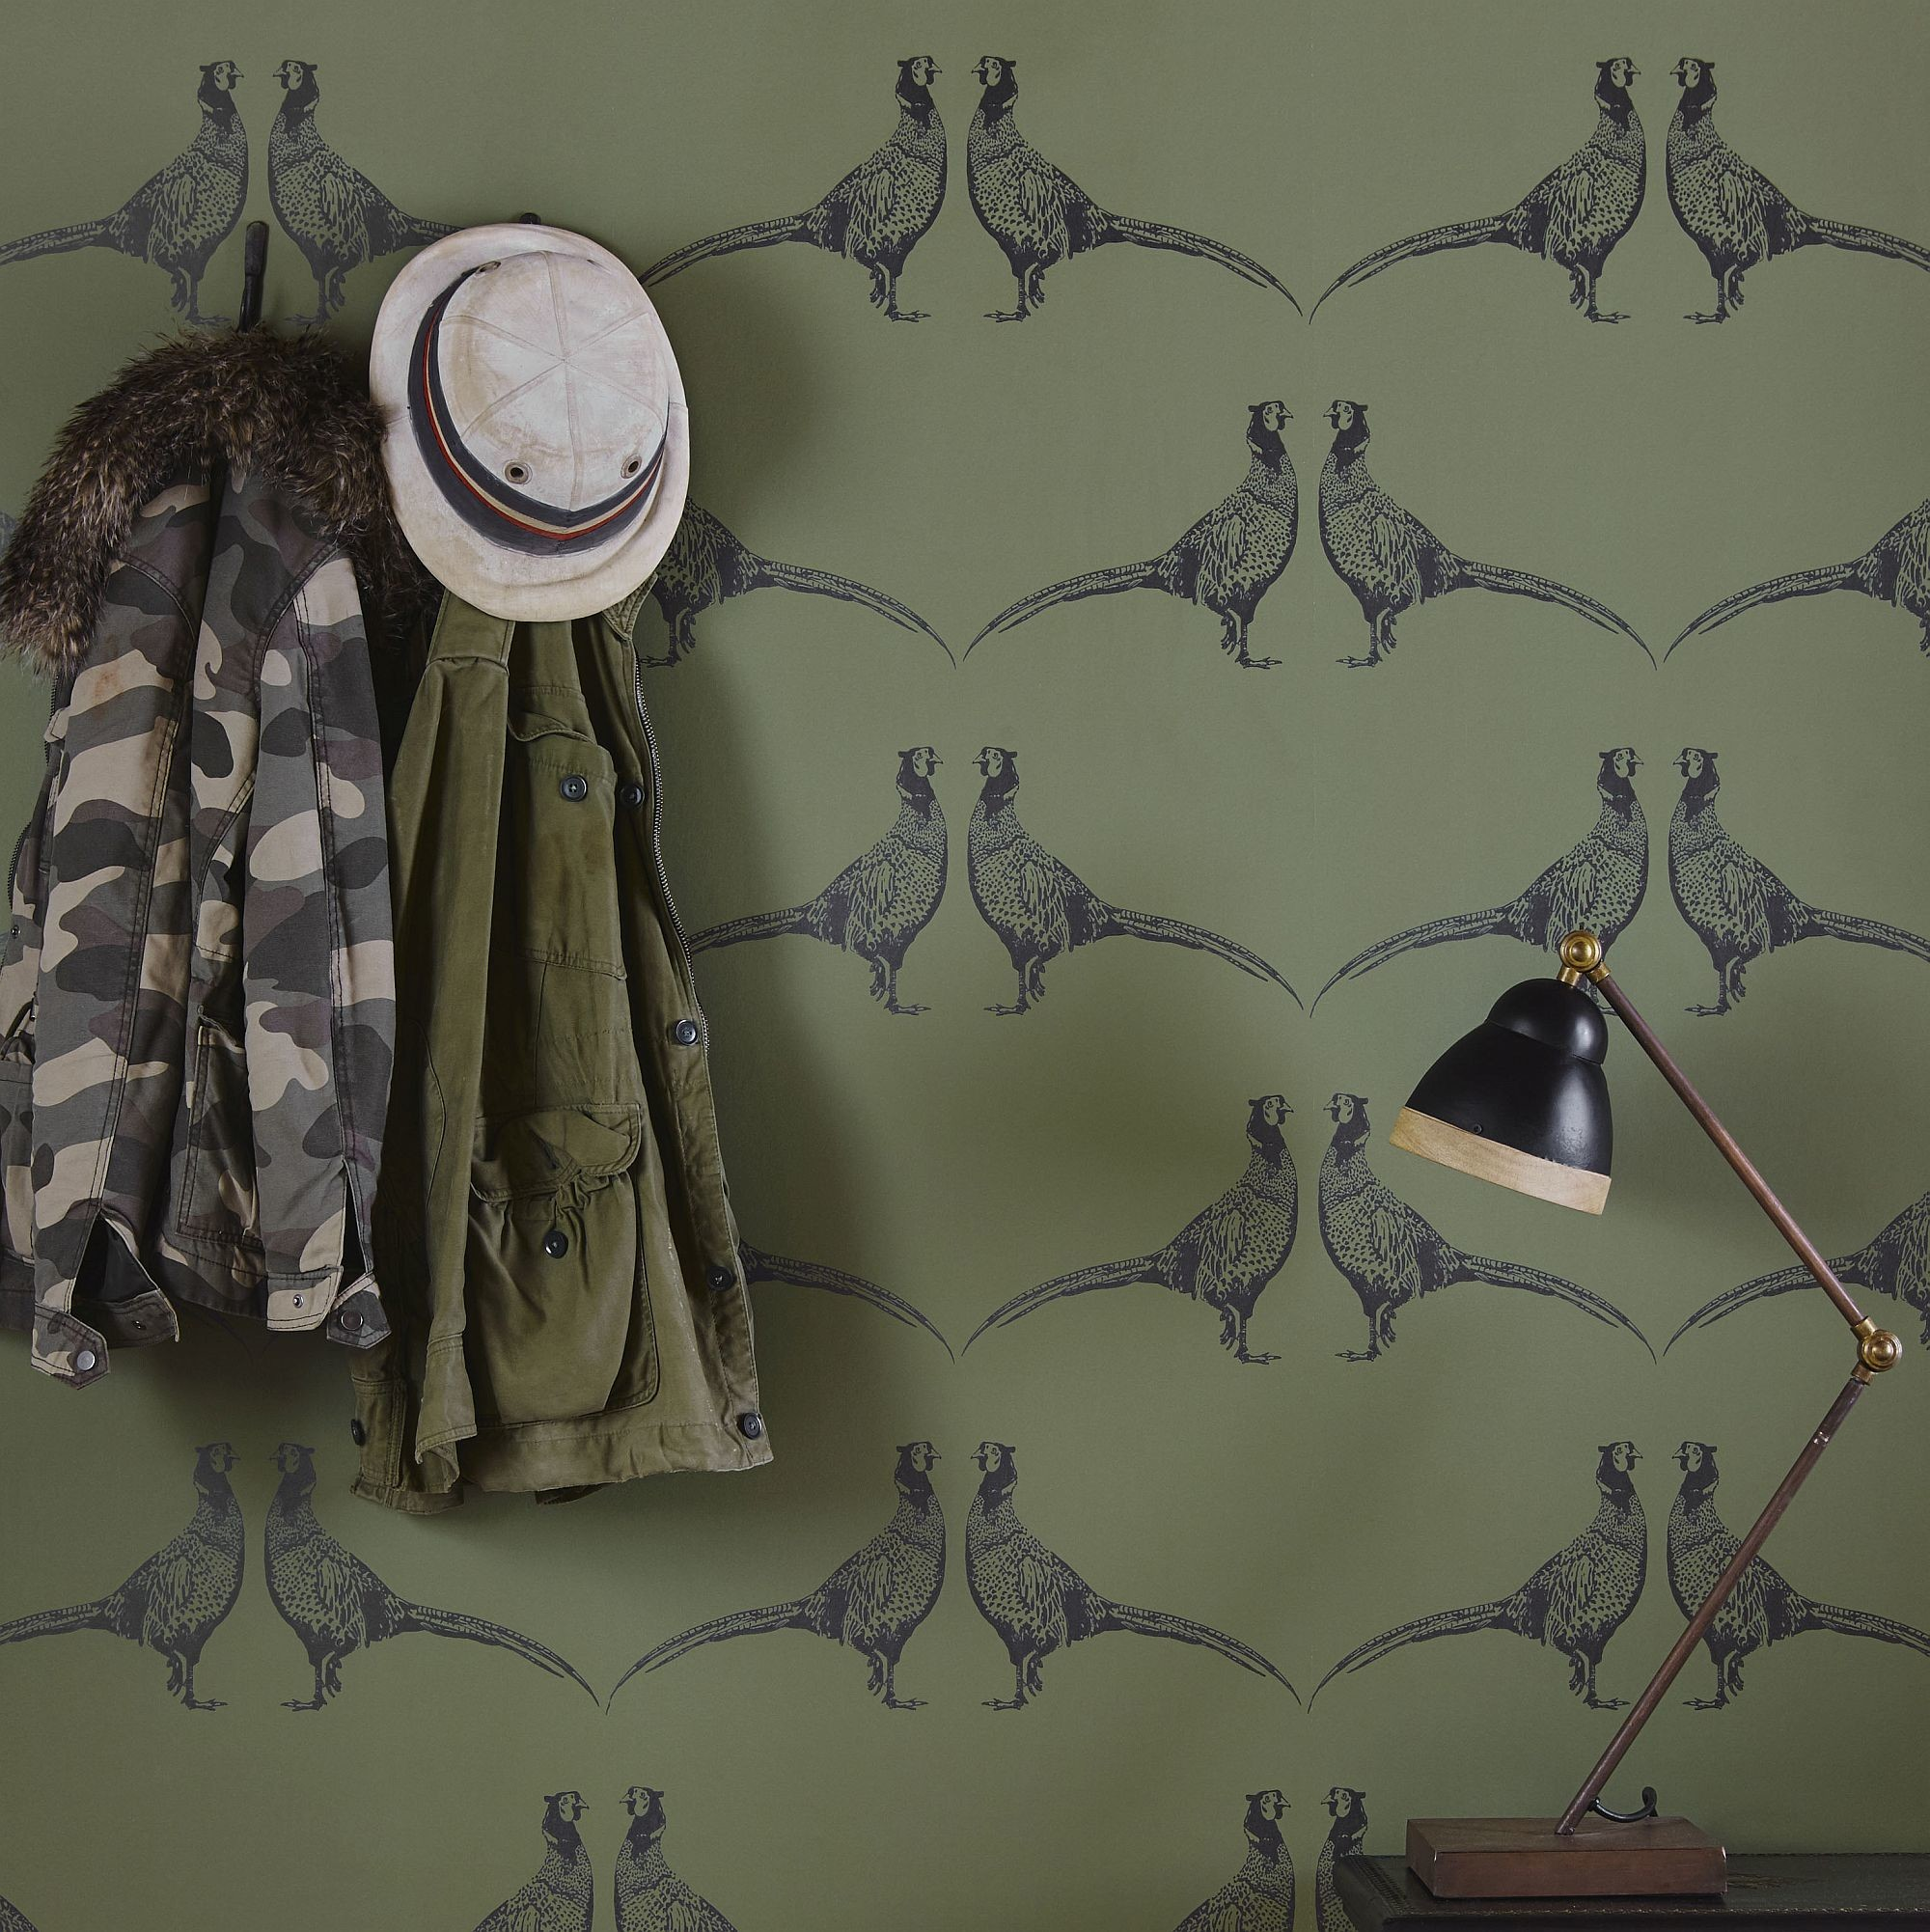 … Barneby Gates Pheasant Camo Green Wallpaper extra image …